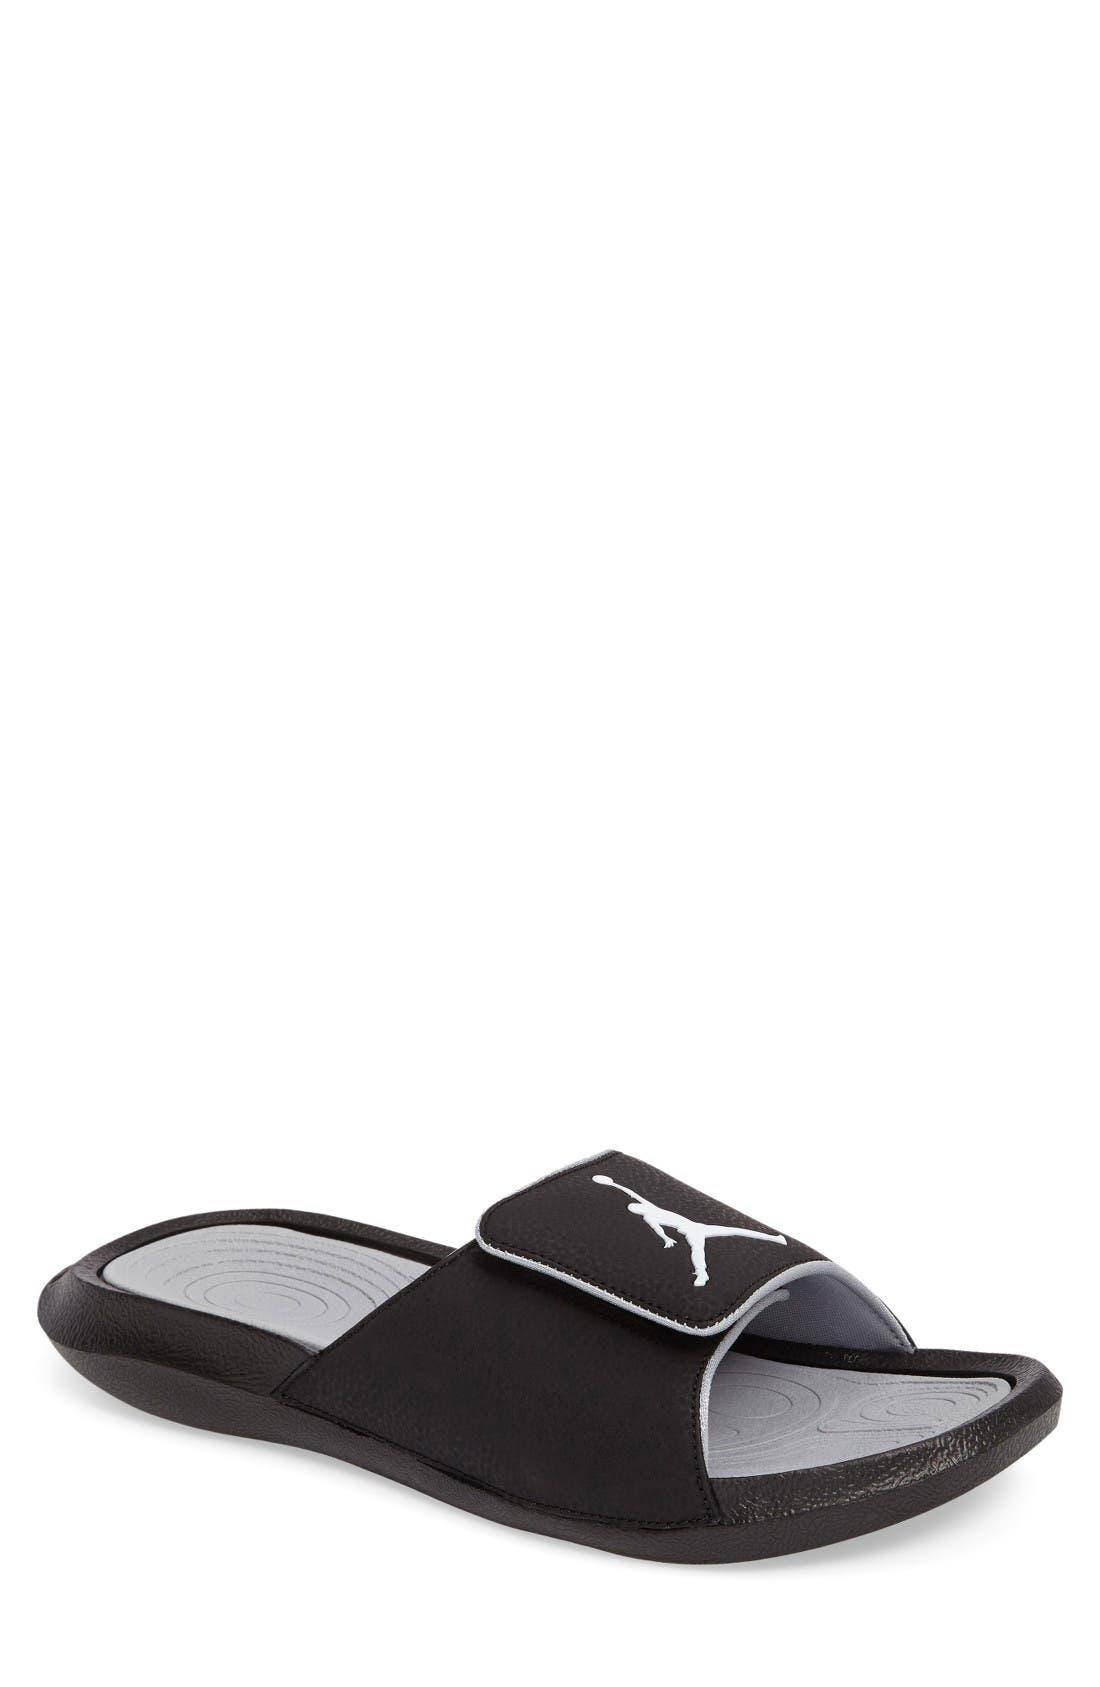 Alternate Image 1 Selected - Nike Jordan Hydro 6 Slide Sandal (Men)